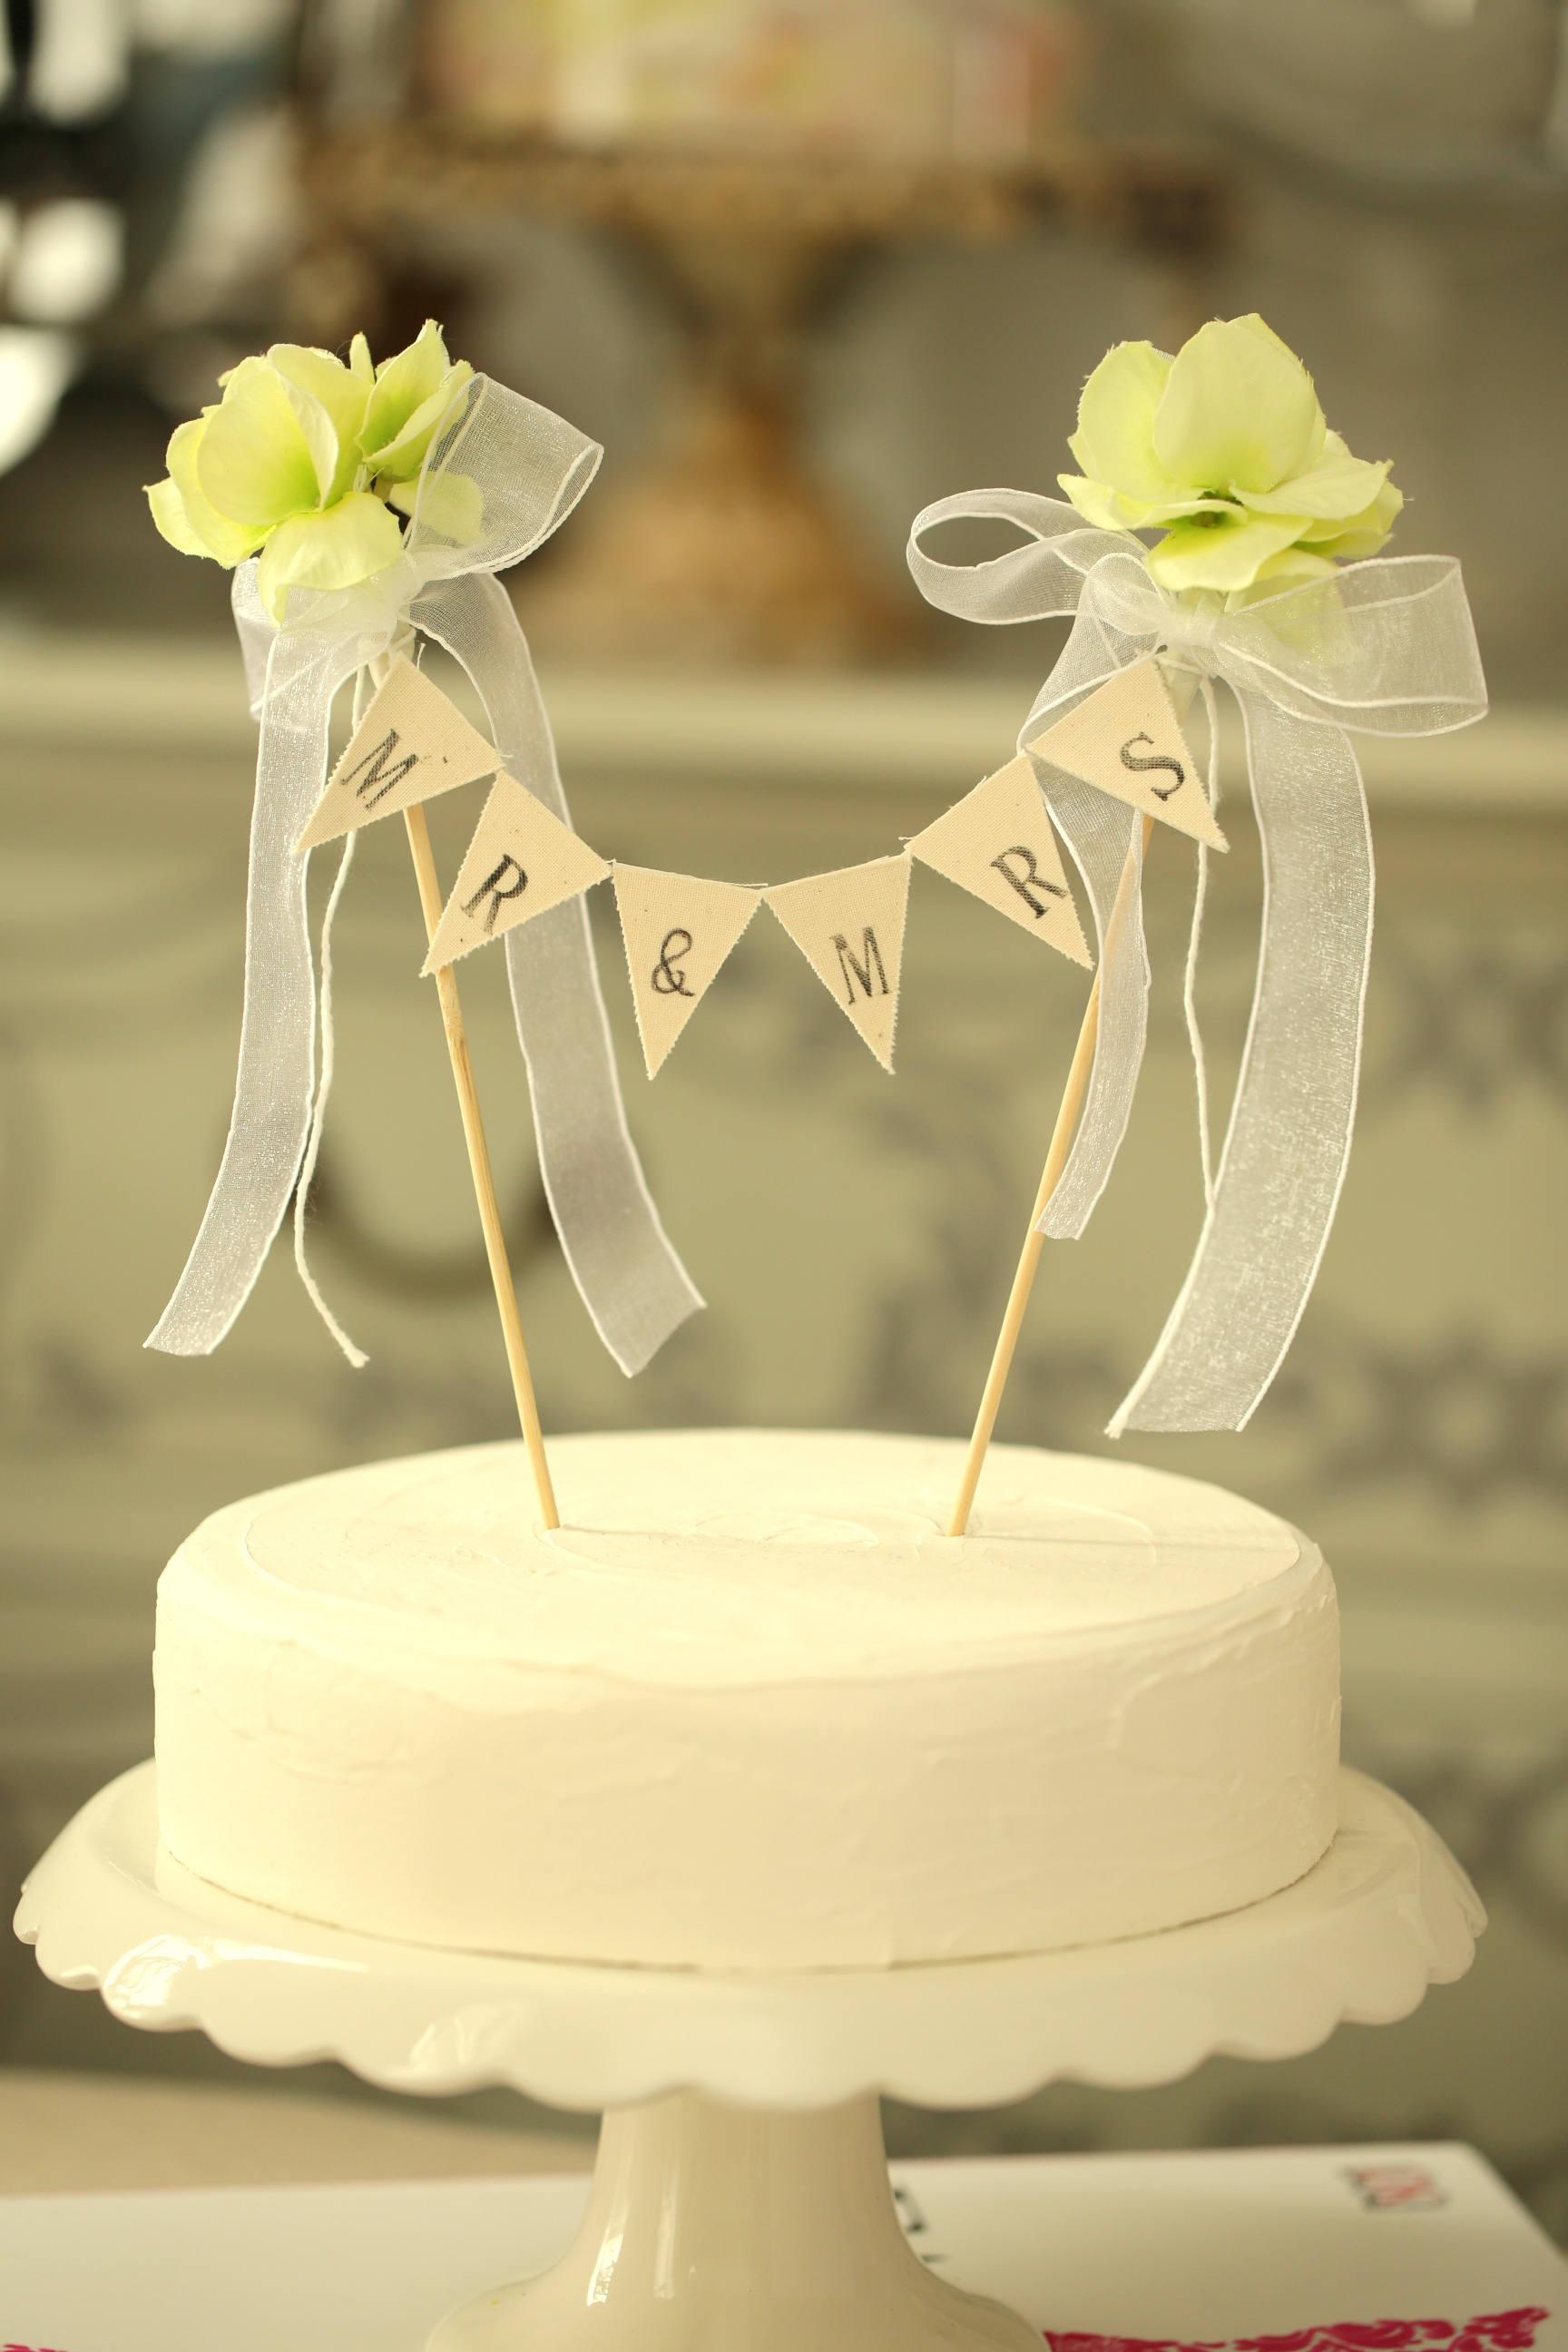 Mr & Mrs Wedding Cake Banner,Flower Cake bunting,Rustic Wedding Cake ...